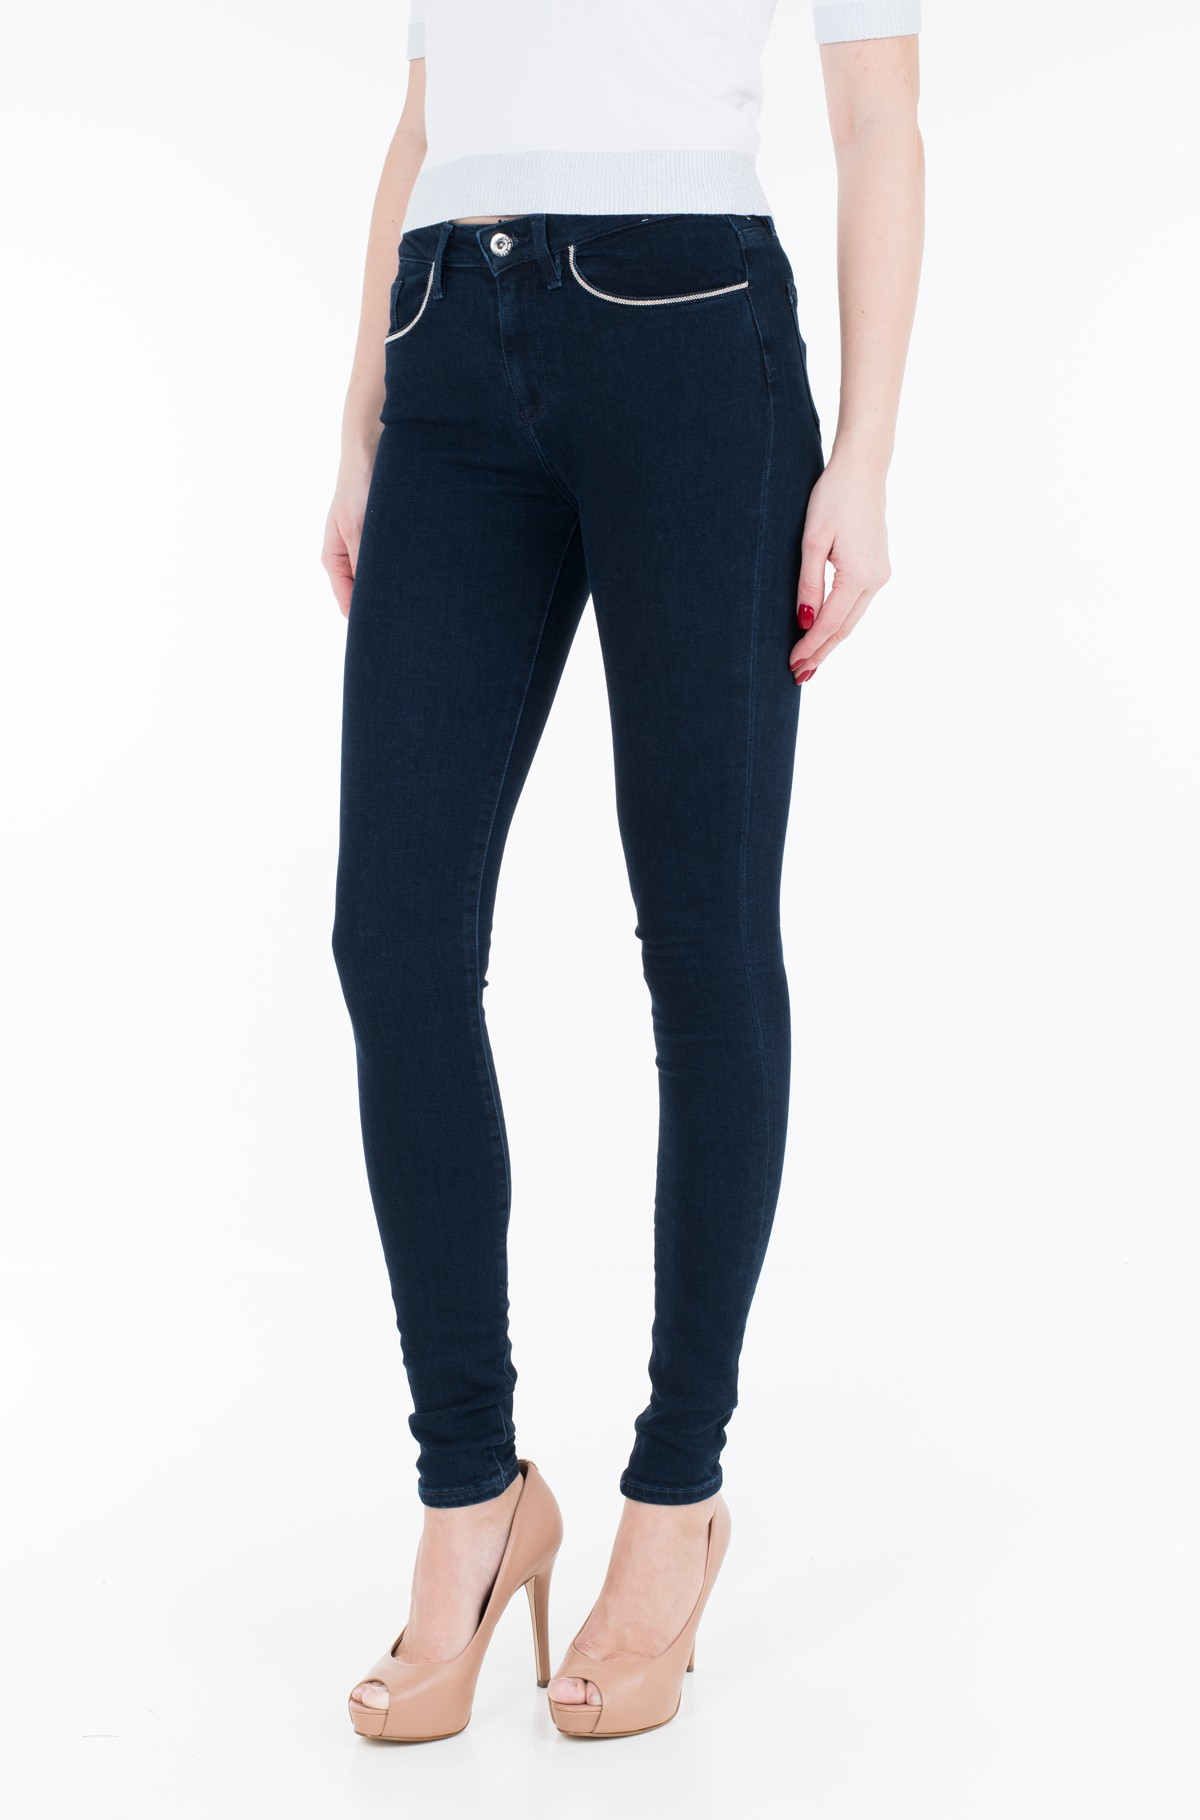 Jeans COMO RW ASTRA-full-1